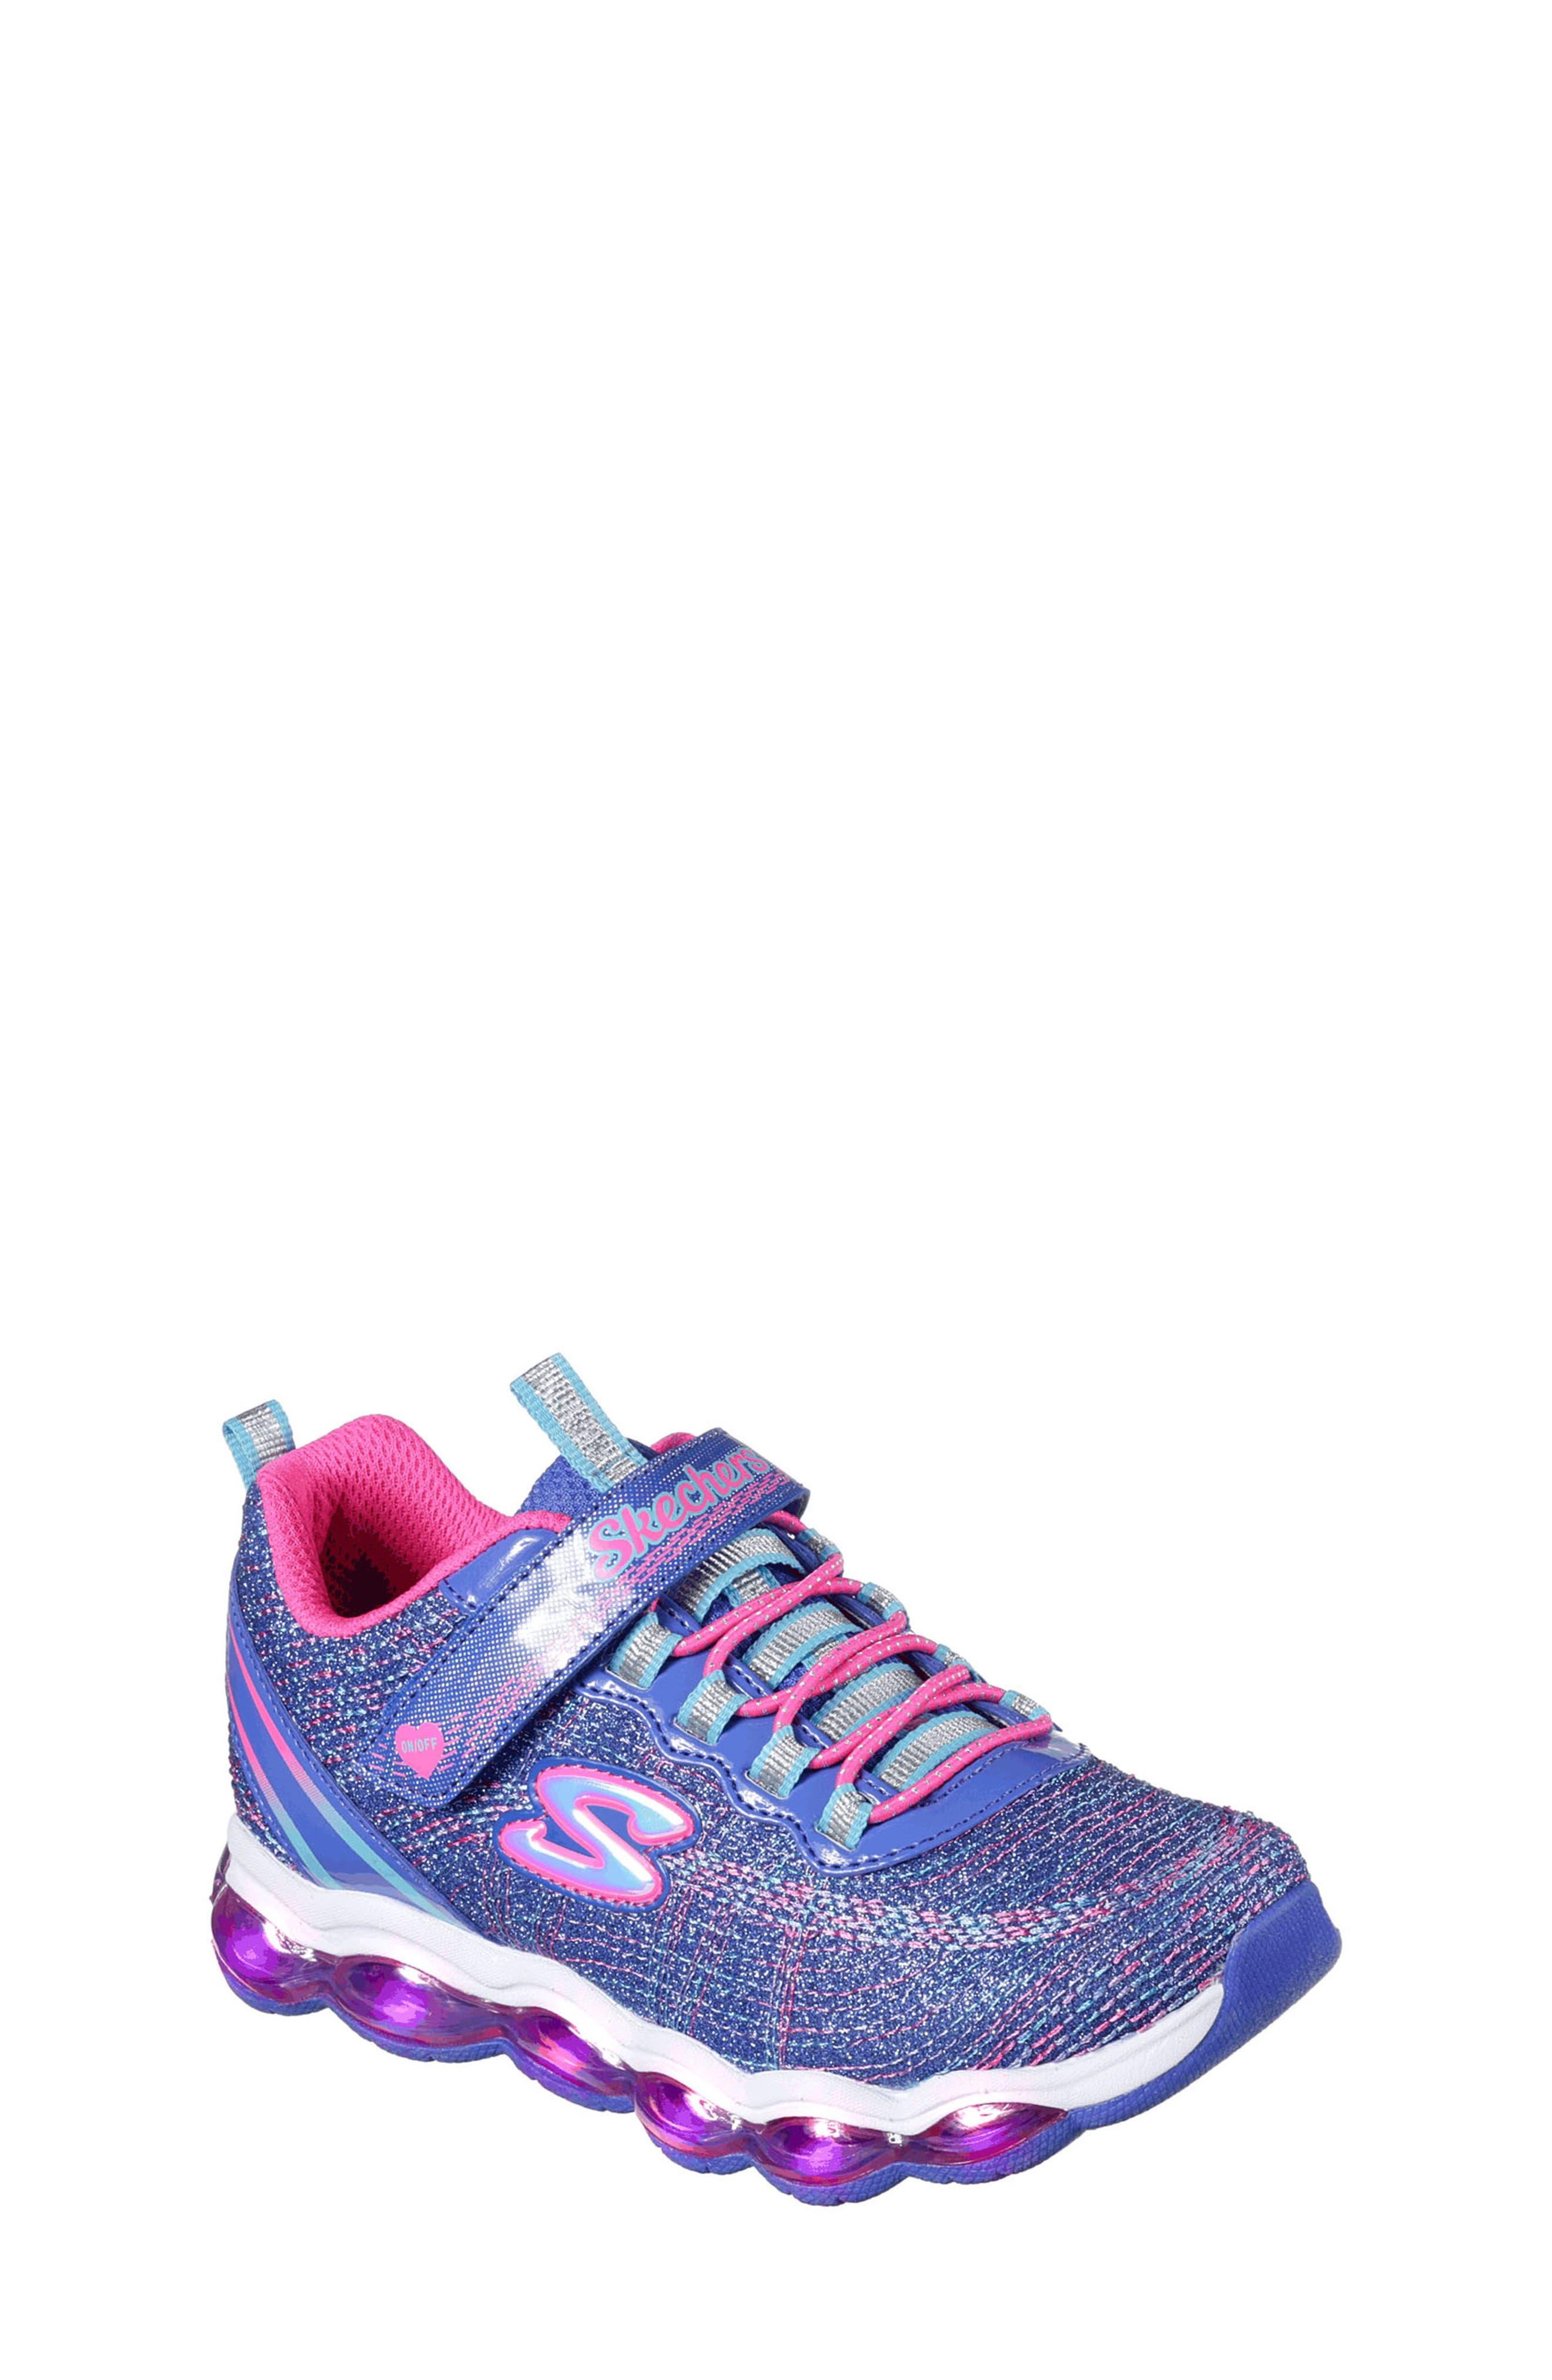 Main Image - SKECHERS Glimmer Lights Sneakers (Toddler & Little Kid)